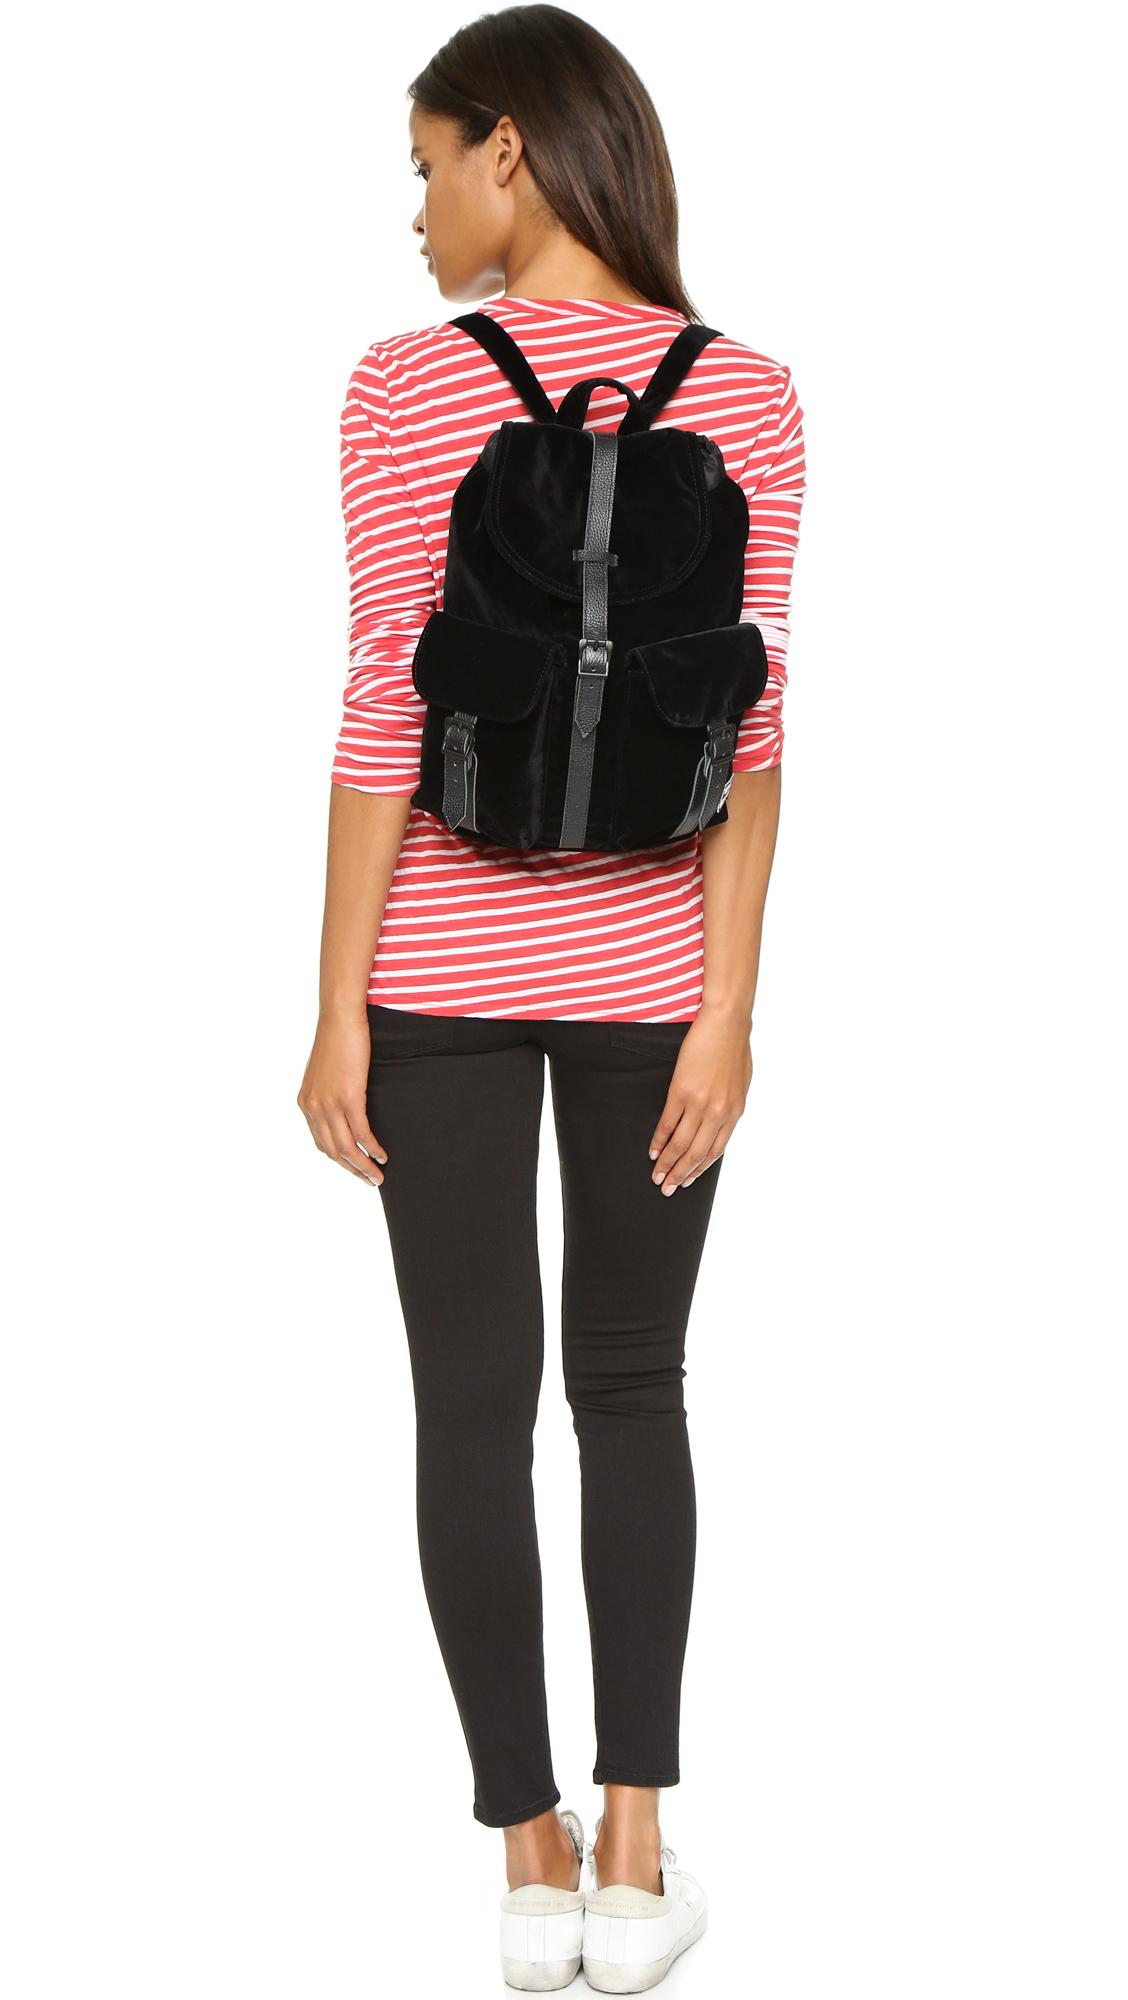 0f924a743f Lyst - Herschel Supply Co. Velvet Dawson Backpack - Black in Black